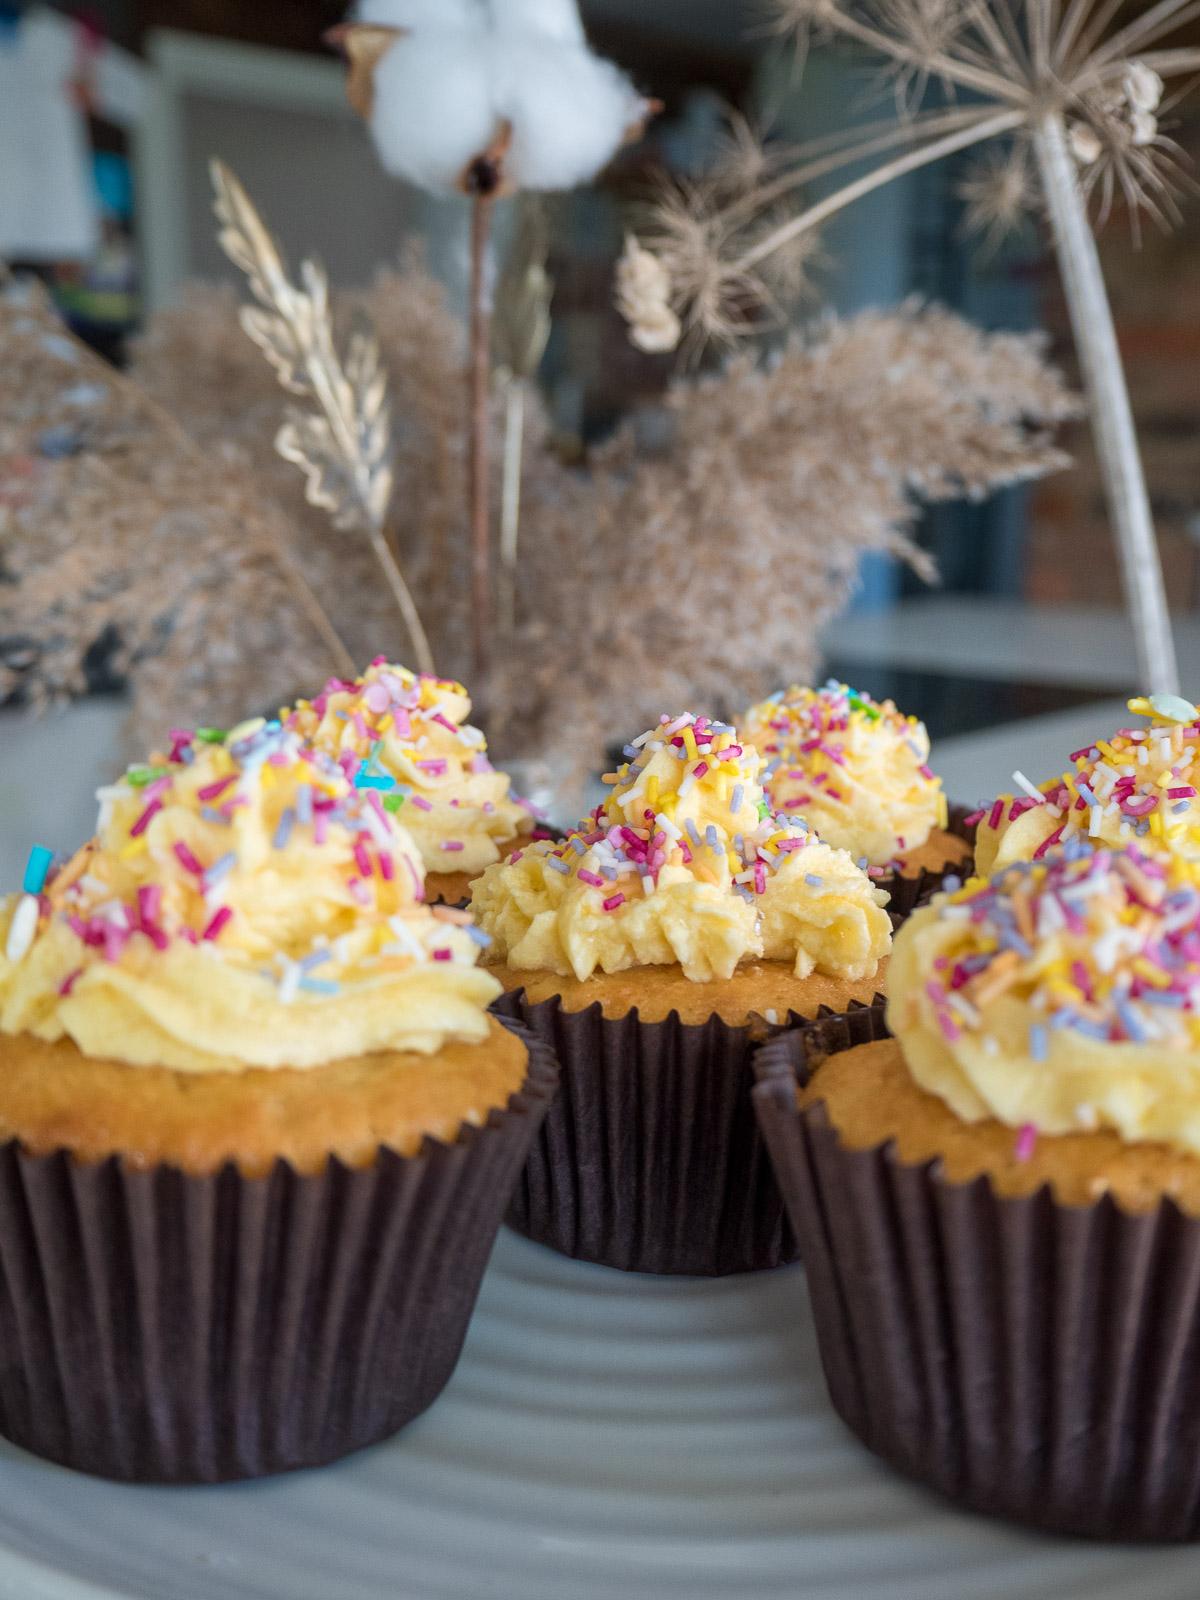 Vanilla Cupcake, Cupcake, Baking, Easy Baking, Children's Baking, Buttercream frosting